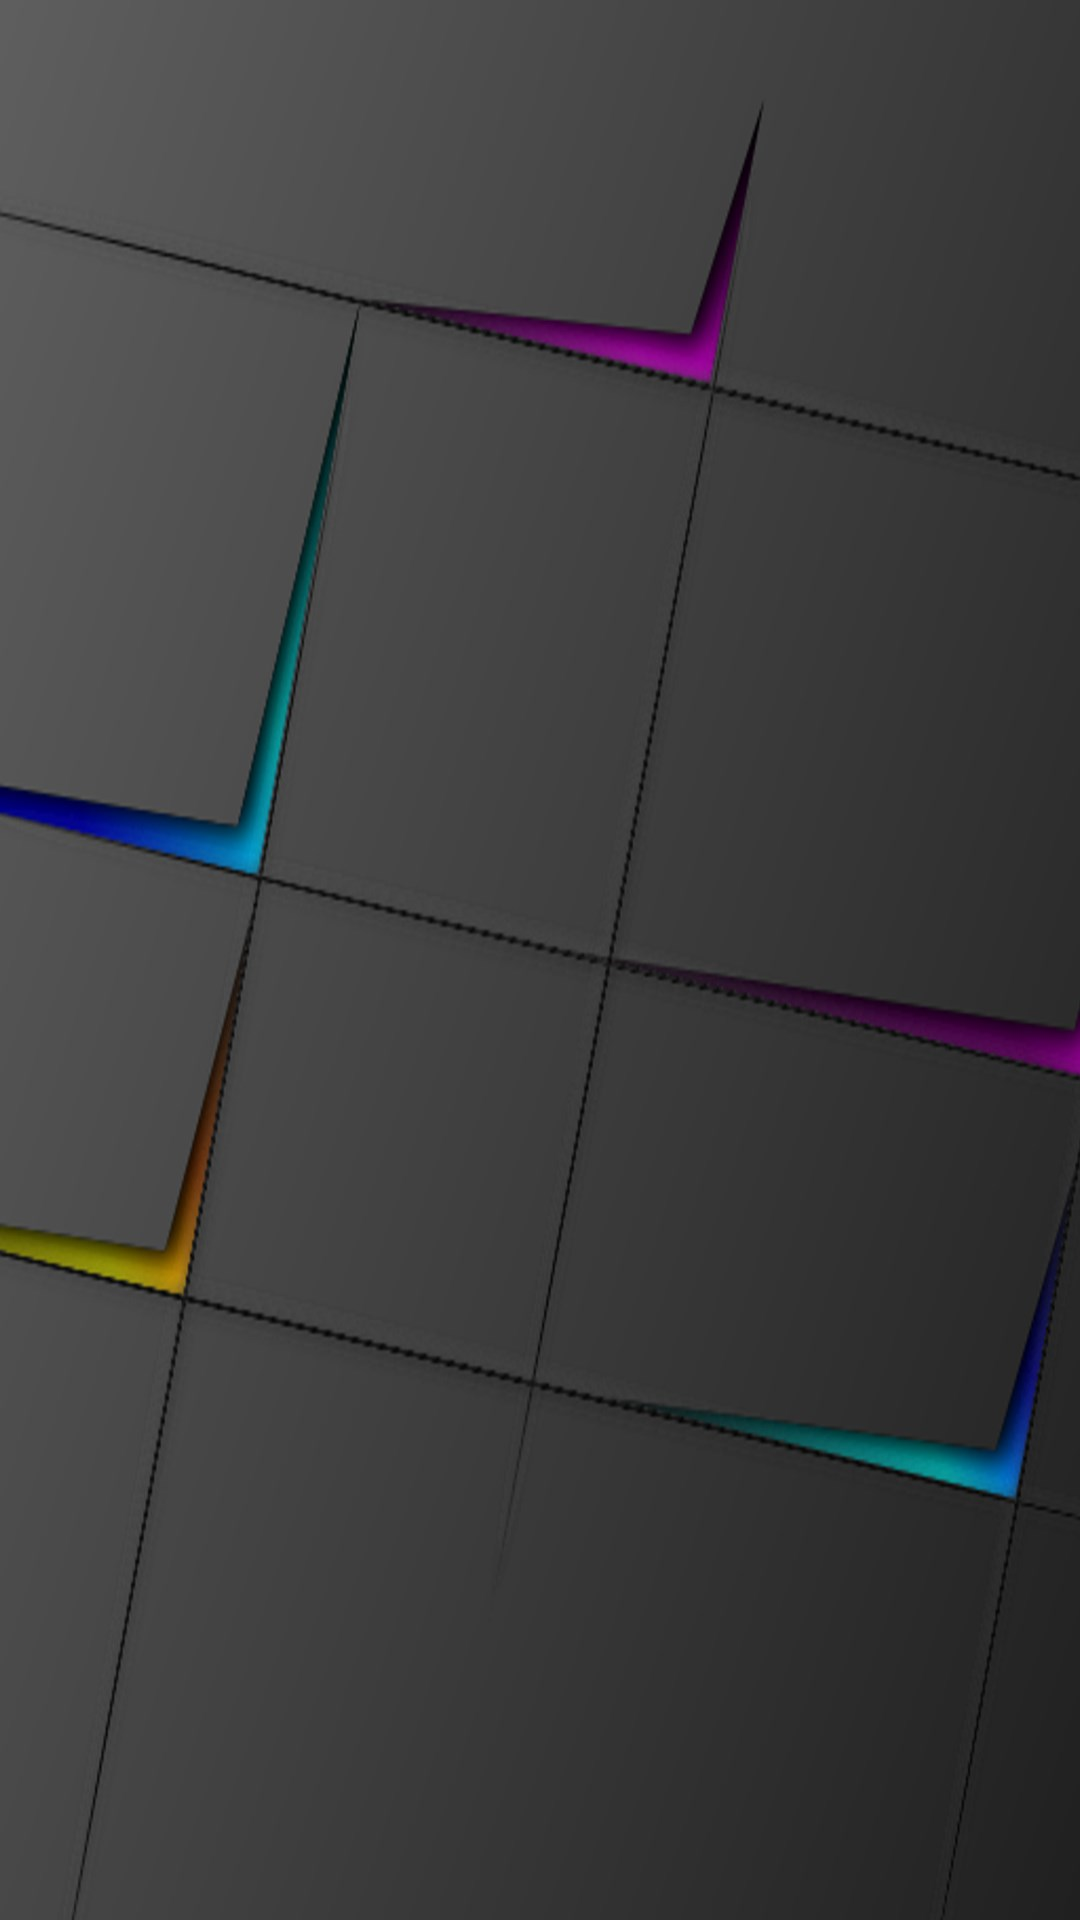 Hd wallpaper 1080x1920 - 1080x1920 Hd Wallpaper Appsapk 172